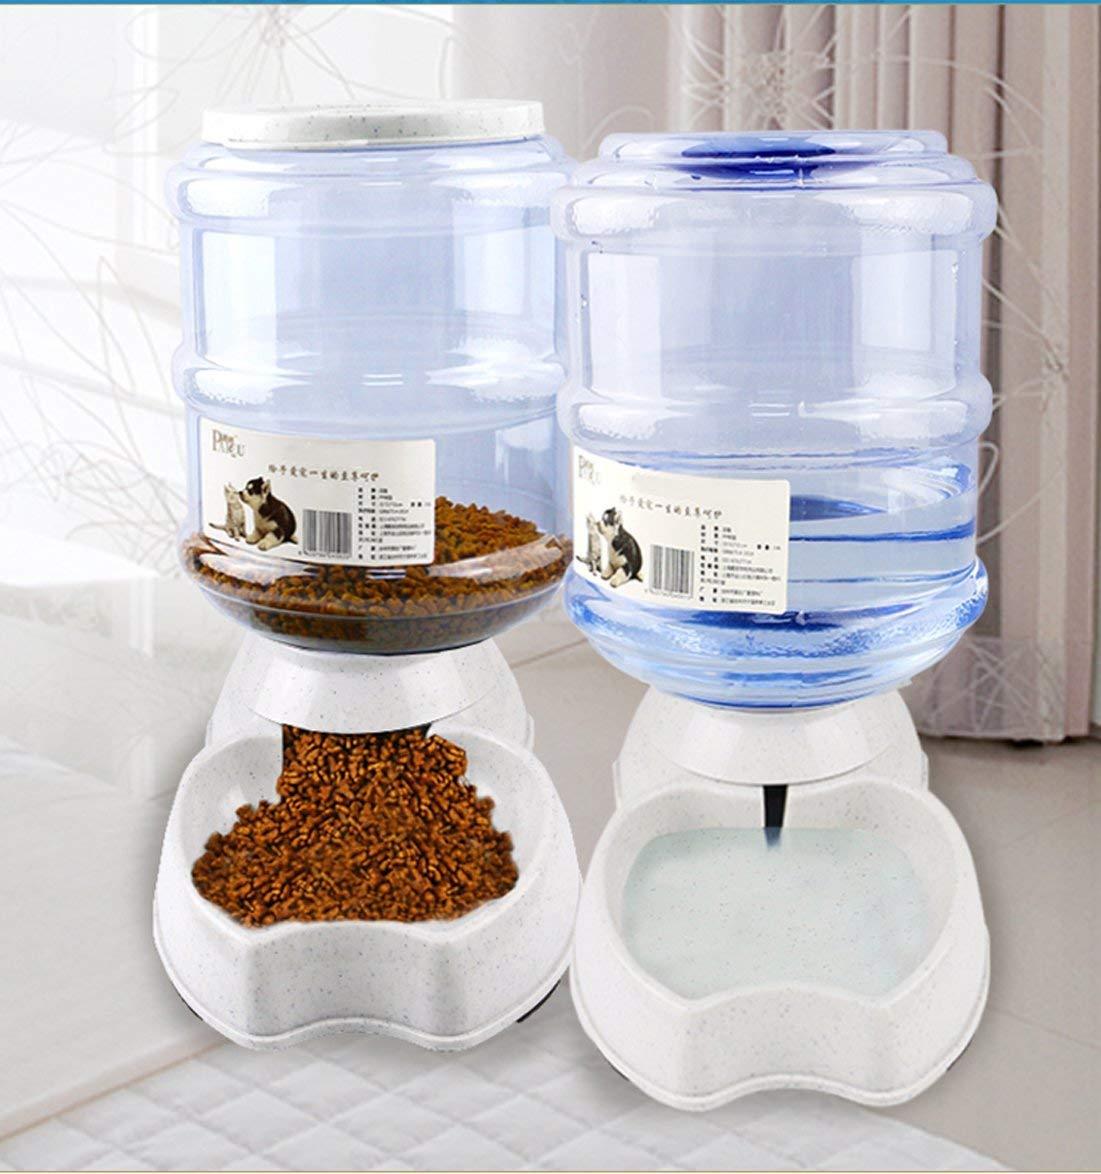 meleg otthon Pet Water Feeder Dispenser, Automatic Pet Waterer,Dog Cat Water Food Combo,Pet Water Dispenser Station,Automatic Gravity Water Drinking Fountain Bottle Bowl Dish Stand 1Gal(3.8L)